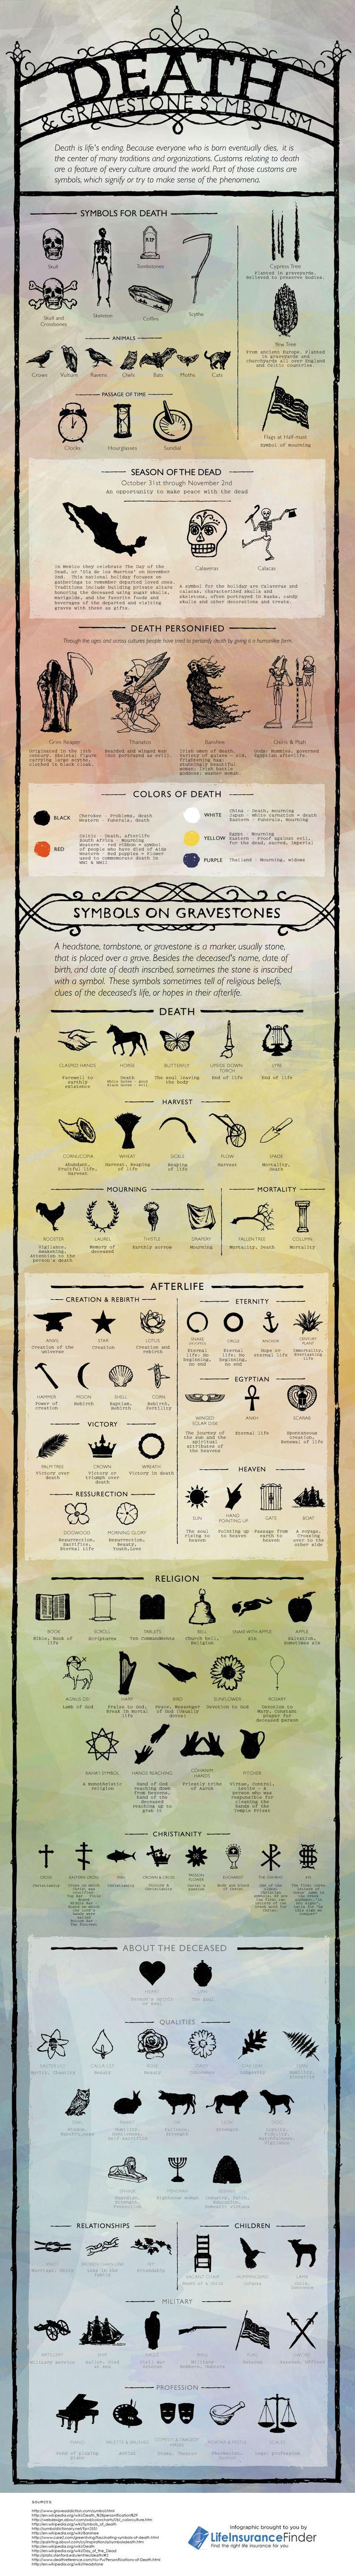 Grave symbols.